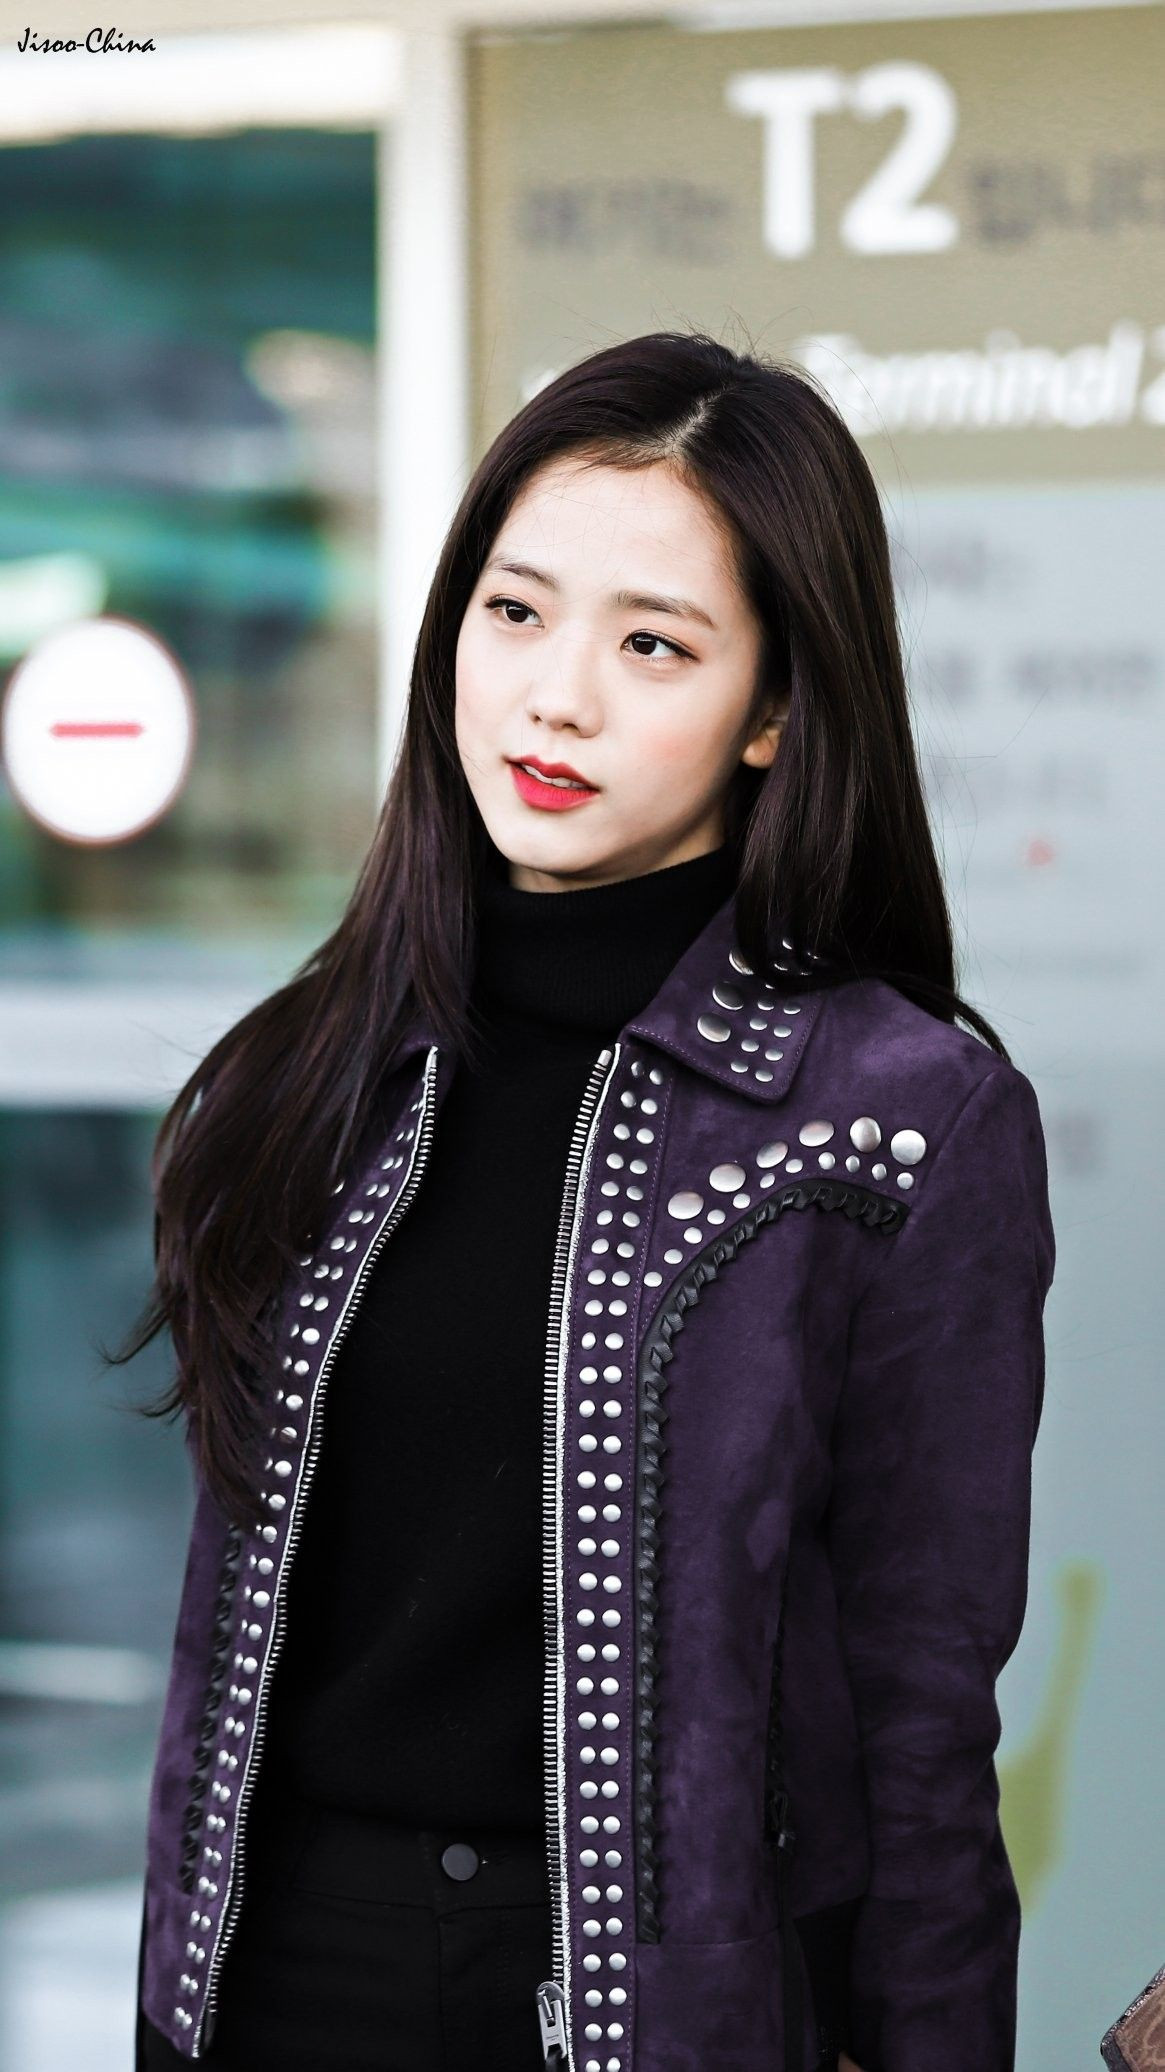 Pin by 로제 on 지수 Jisoo in 2020 Fashion, Blackpink